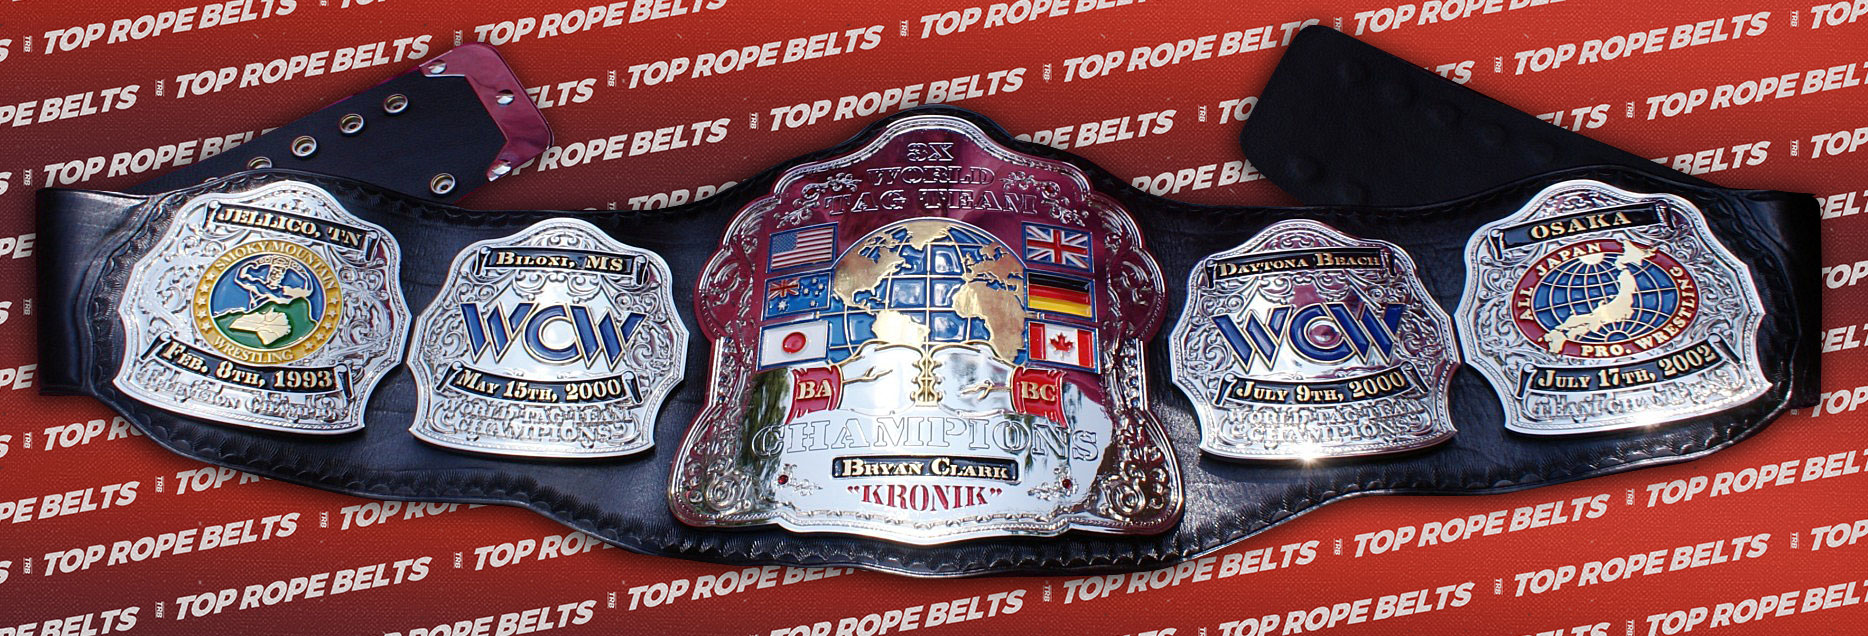 KRONIK Bryan Clark Custom Belt | Top Rope Belts